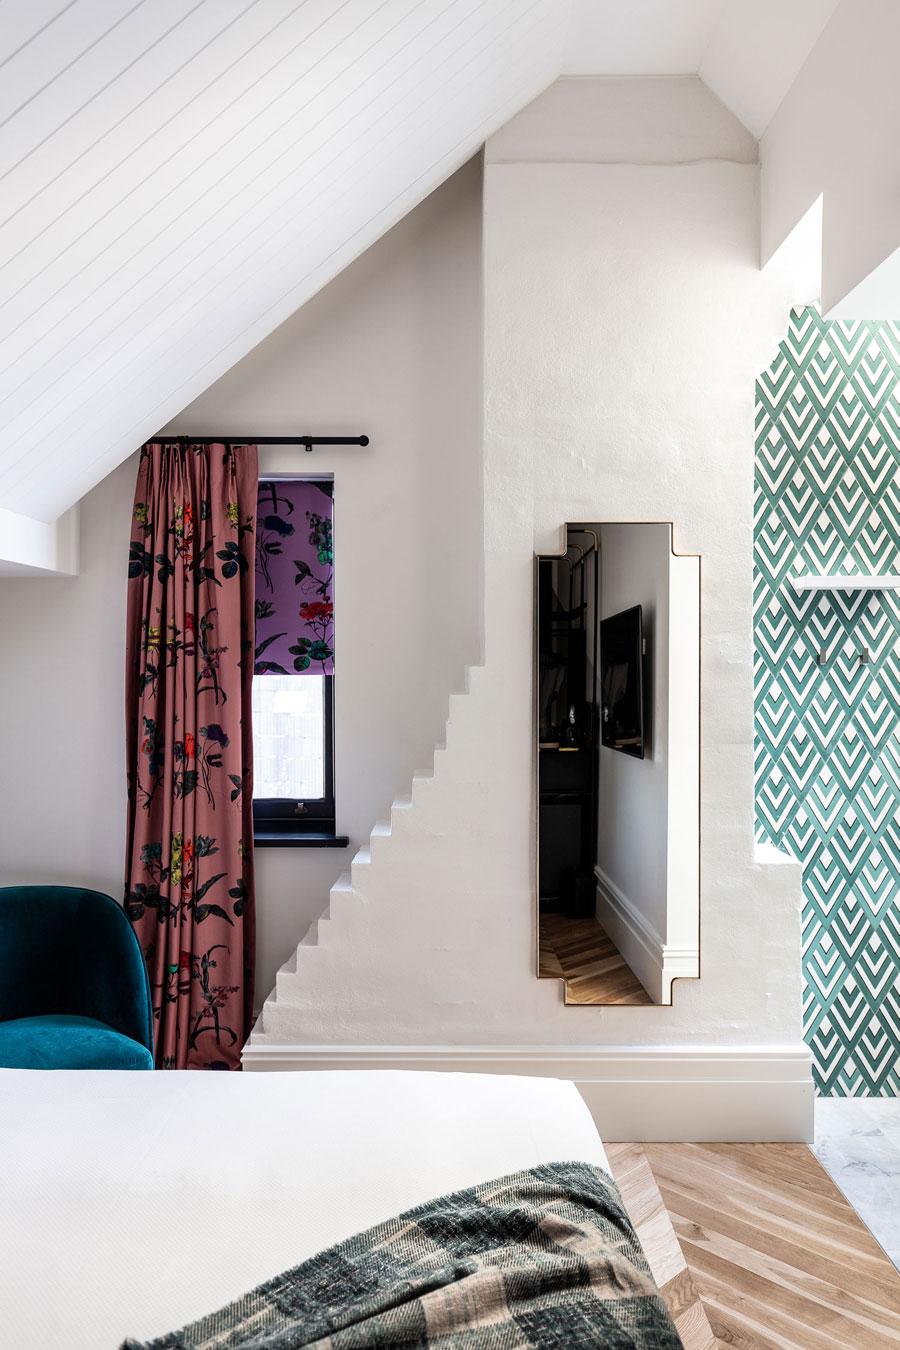 Retro chique badkamer van mooie boetiekhotel uit Sydney